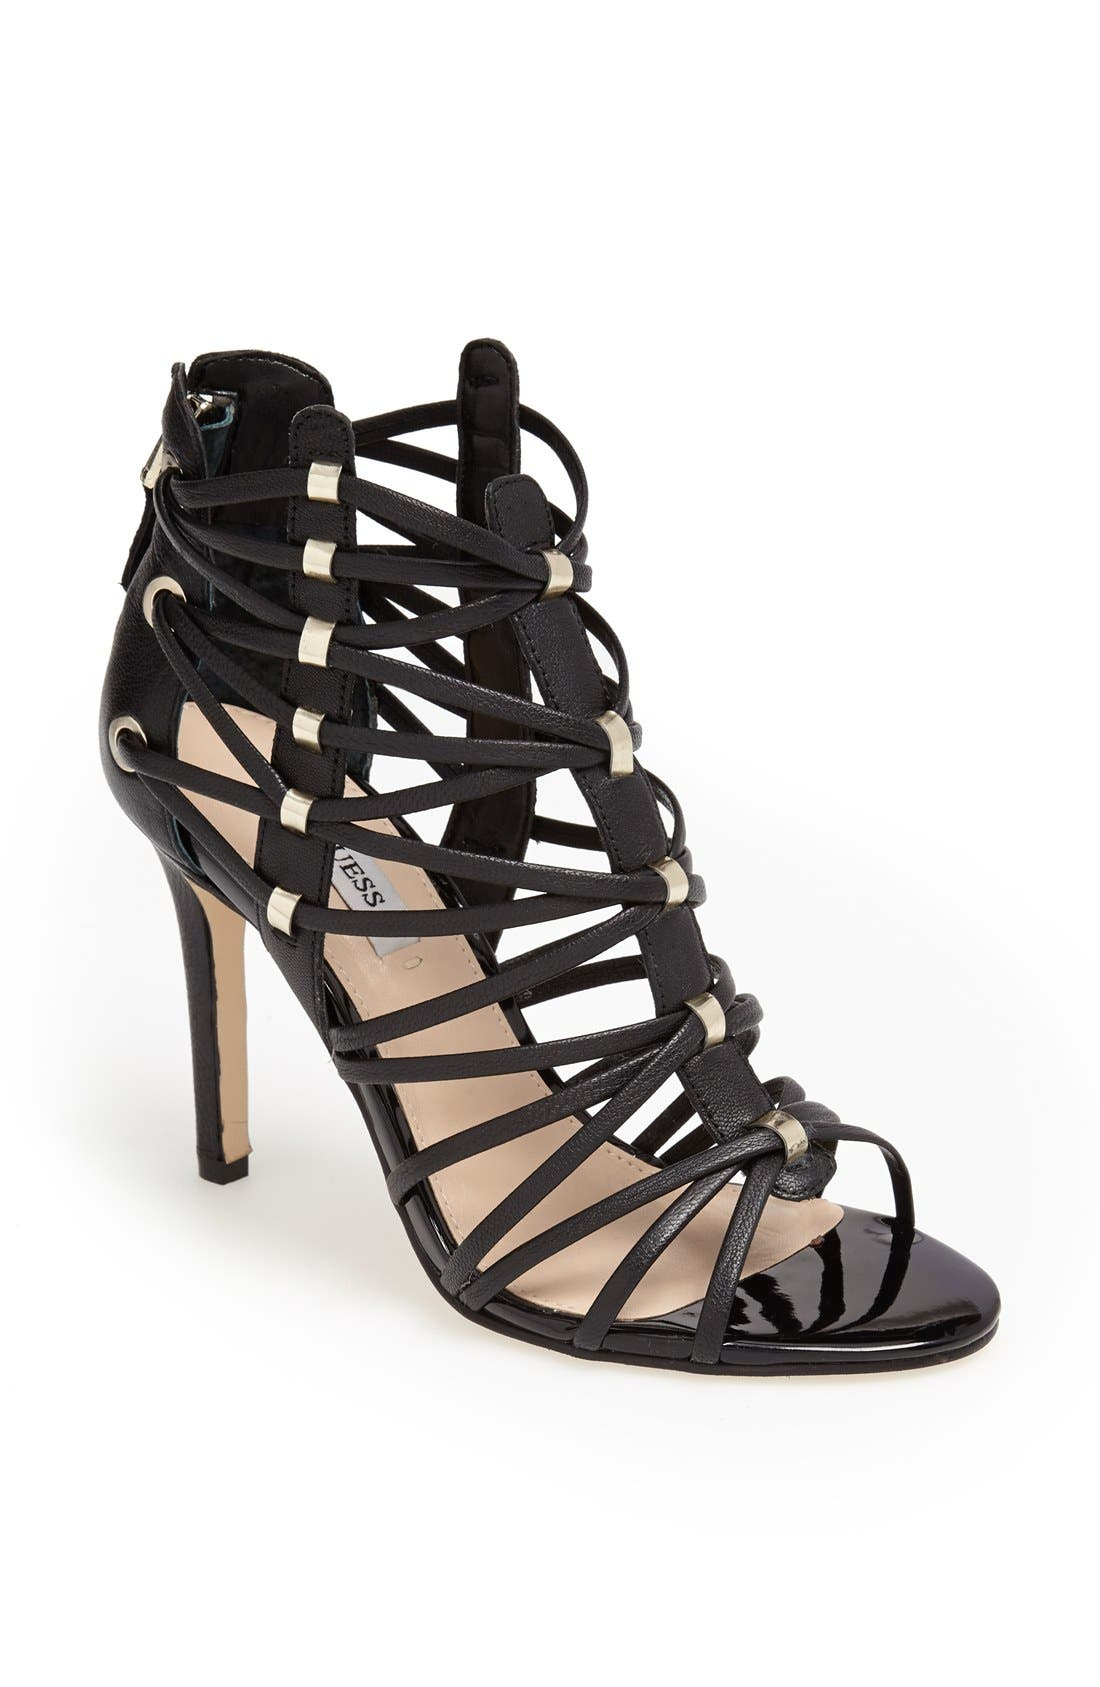 Main Image - GUESS 'Leday' Sandal